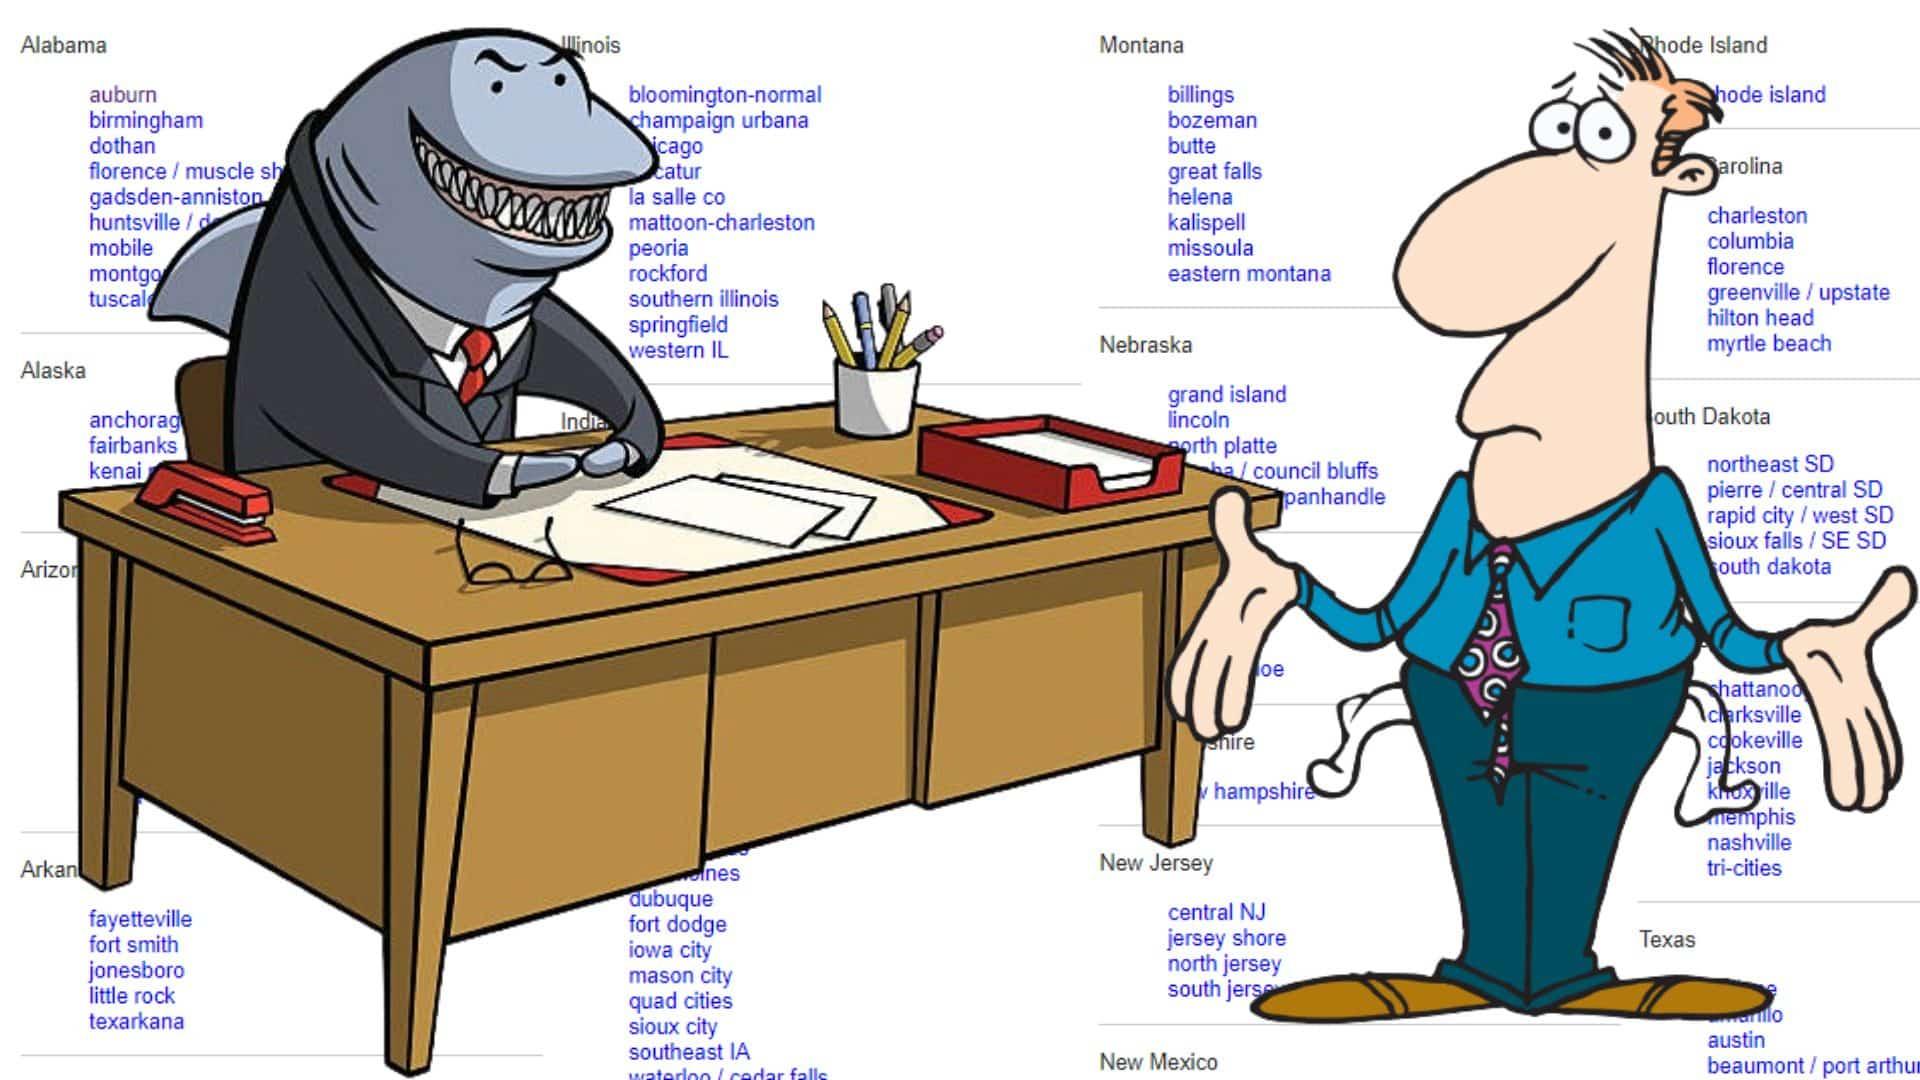 real craigslist loan sharks